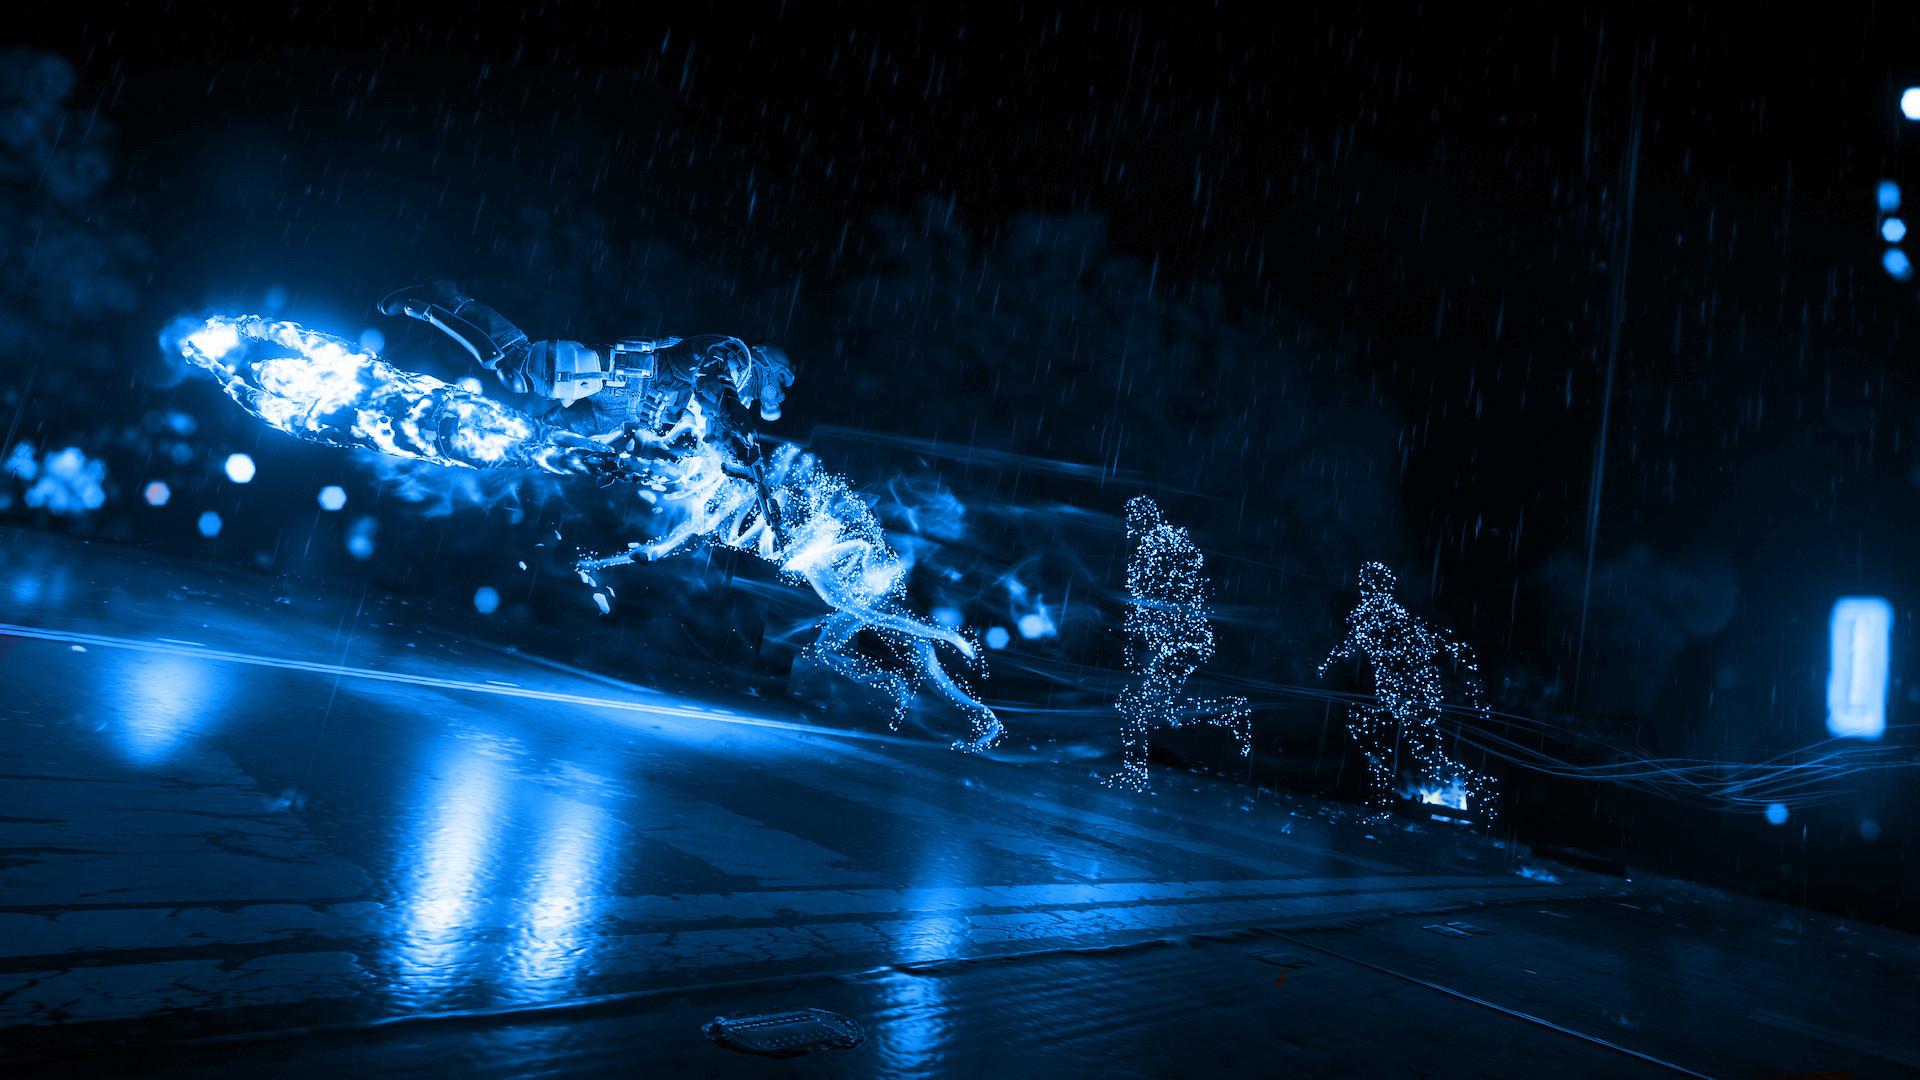 1920x1080 Blue Neon Wallpaper Hd Resolution